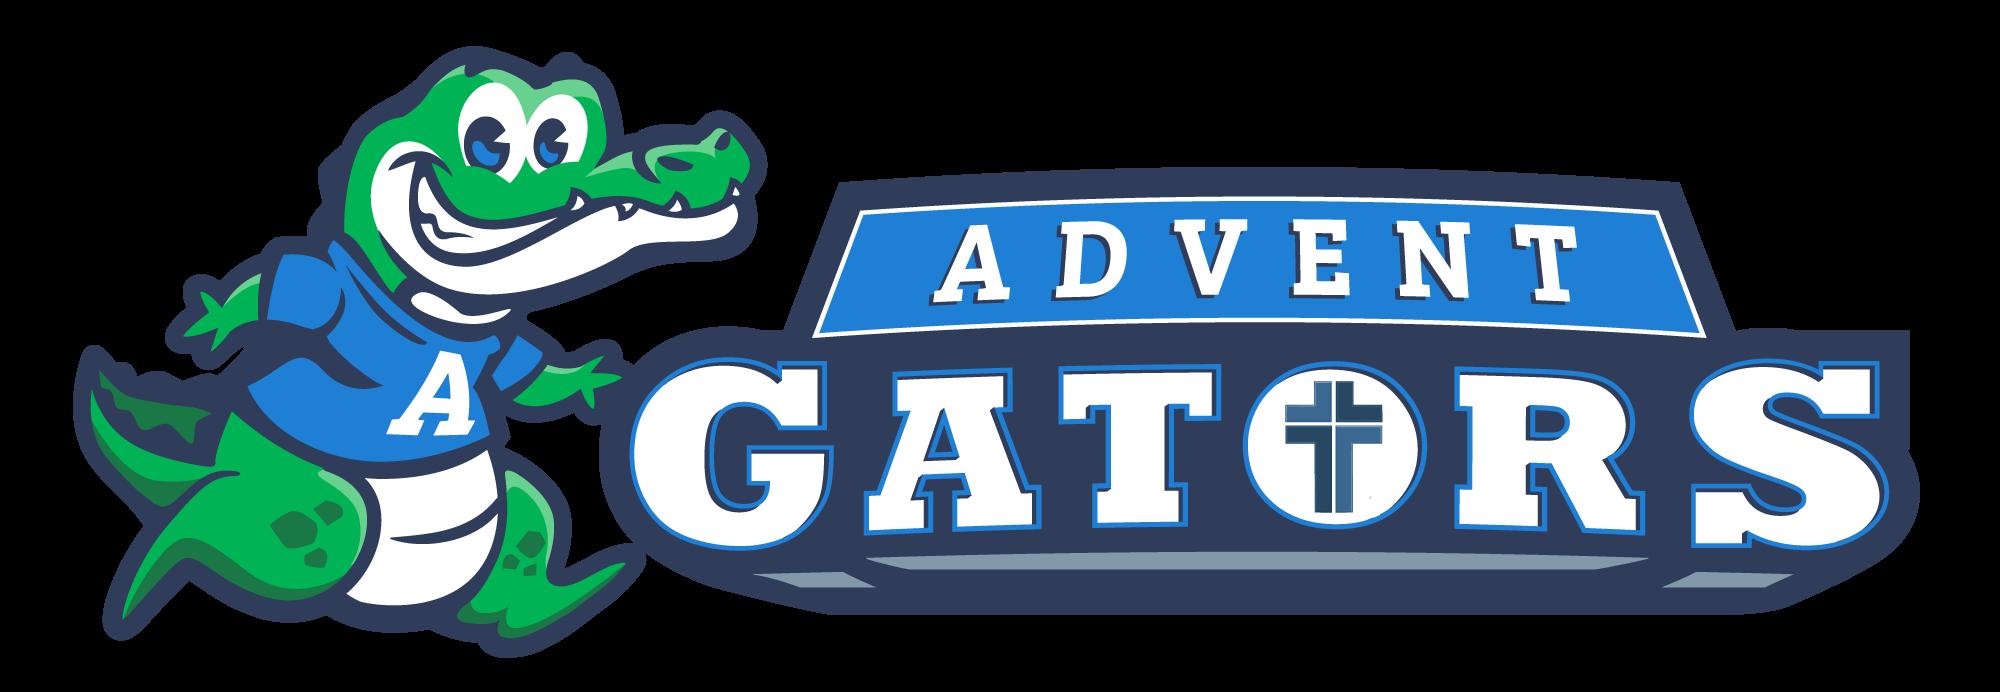 Advent School Gator Mascot Design